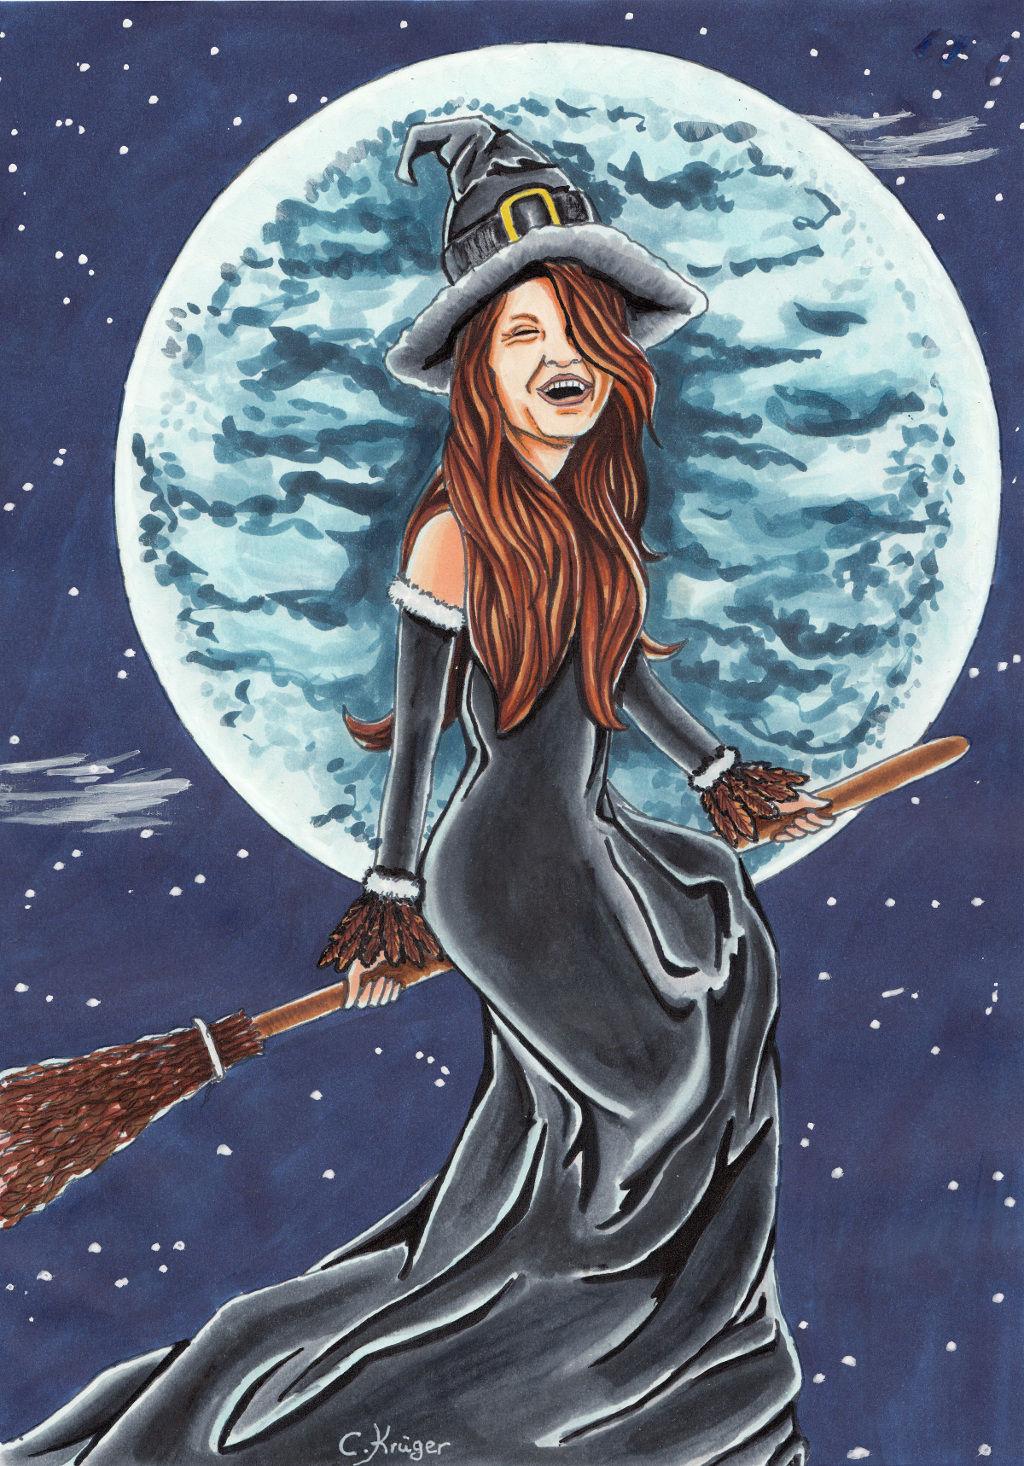 Bild: Hexe, Karneval, Illustrationen, Comic von Thalyndra bei KunstNet